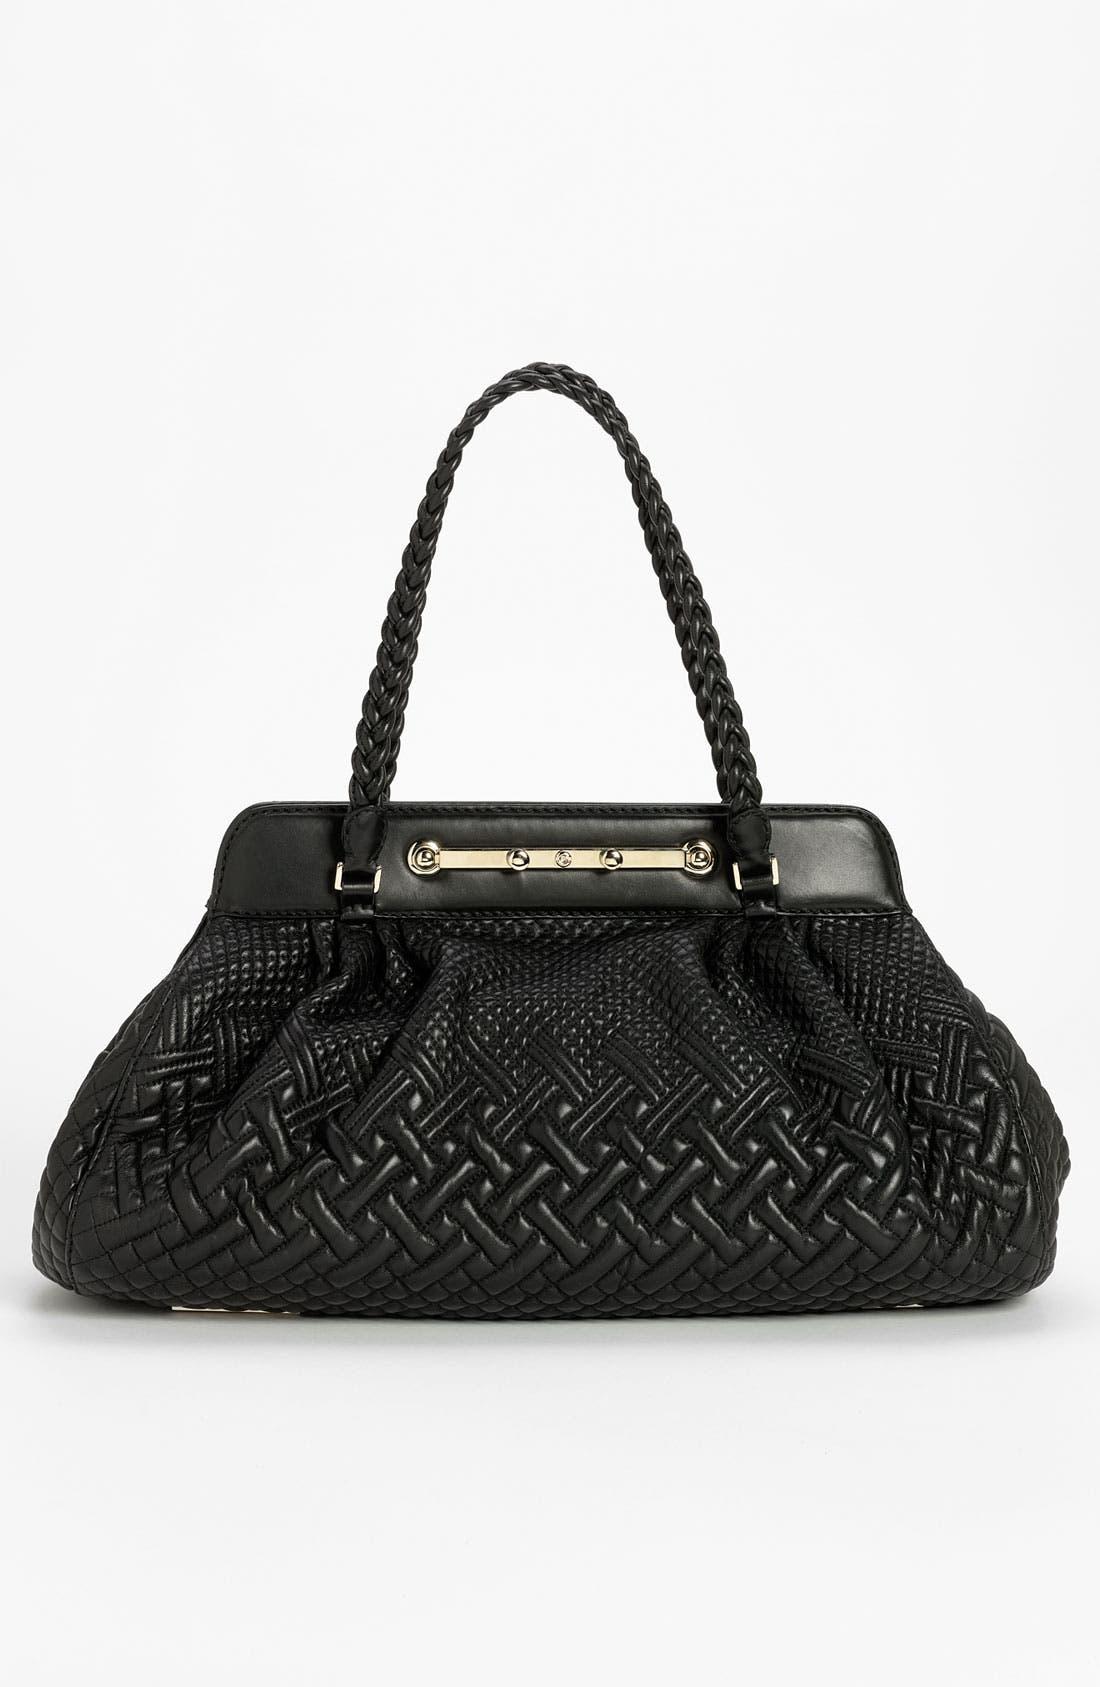 Main Image - Valentino 'Demetra' Leather Shoulder Bag